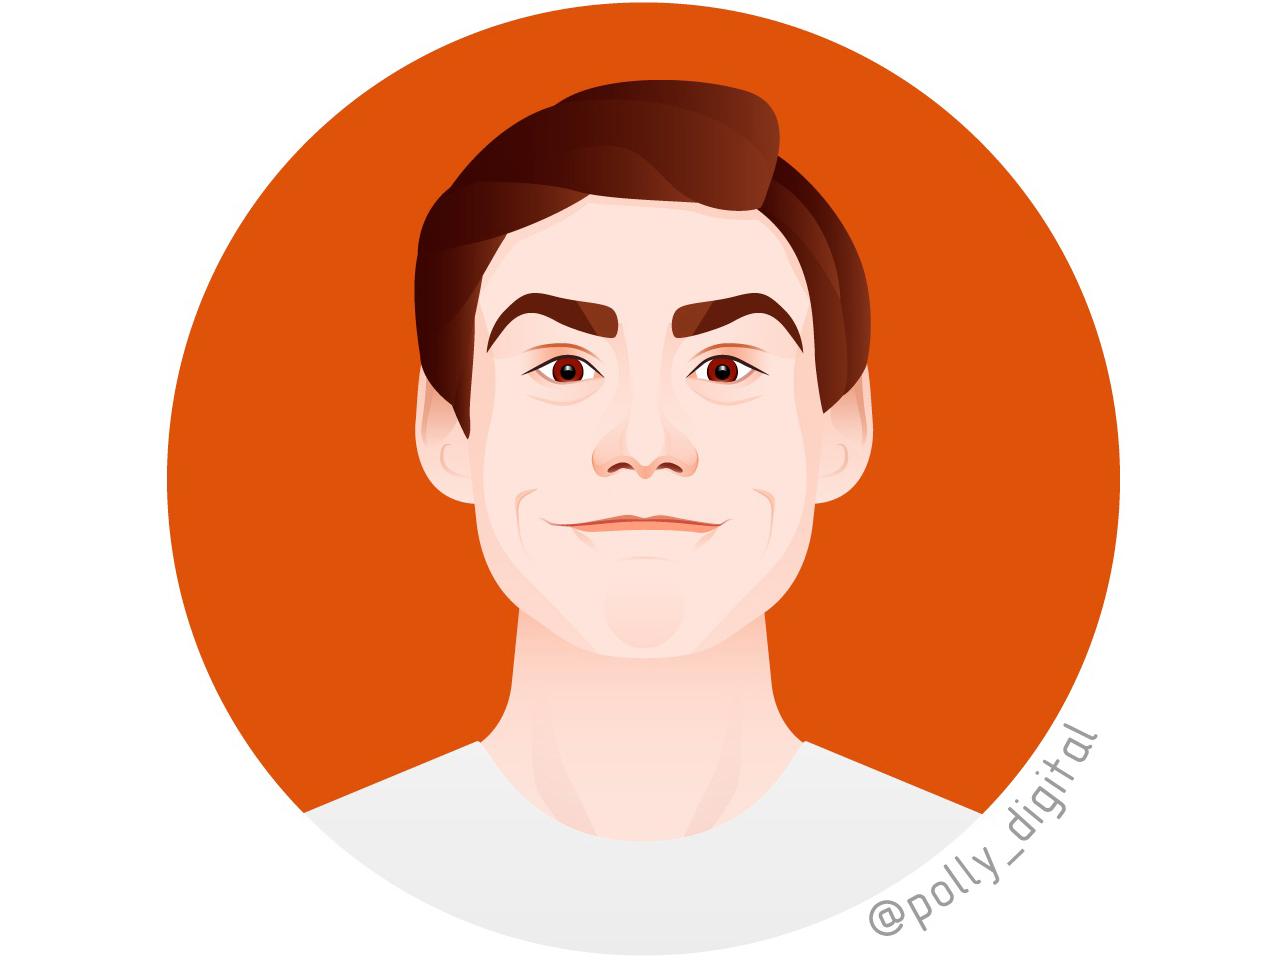 Jim Carrey portrait design portait vector vectorportrait art digital illustrator illistration artist actor